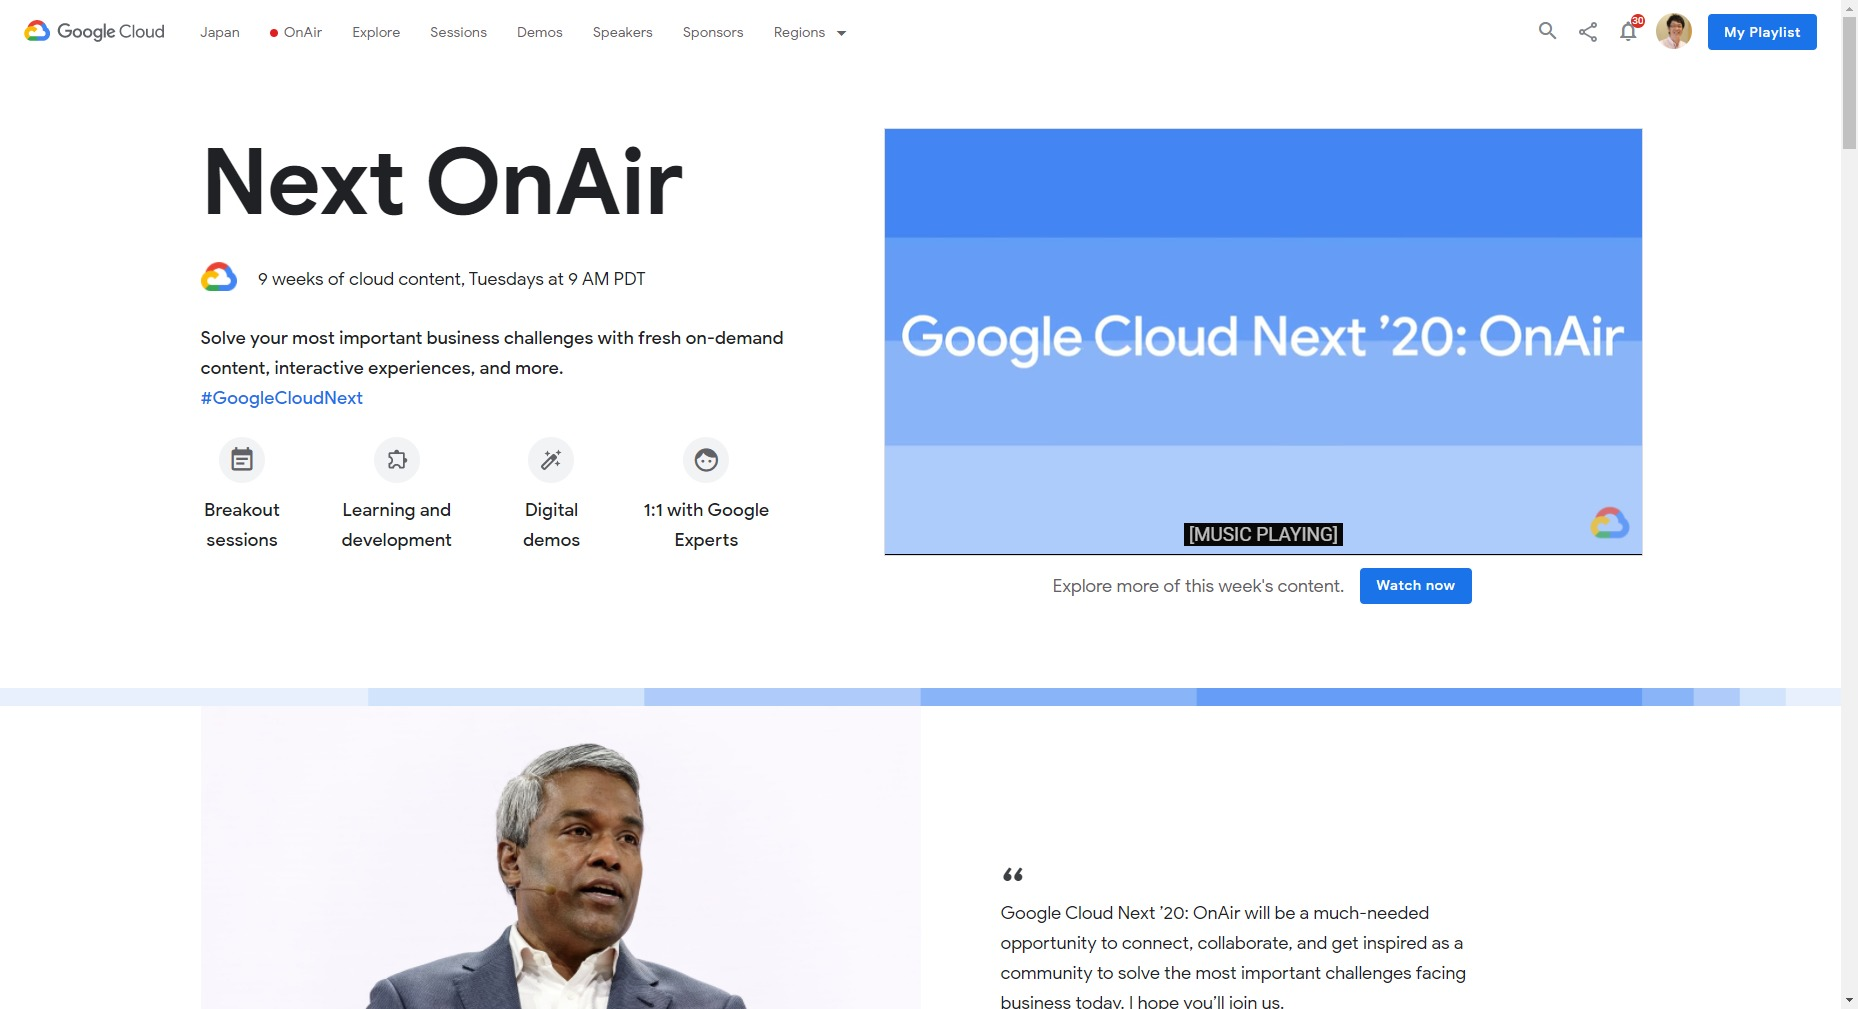 Google Cloud Next '20: OnAir